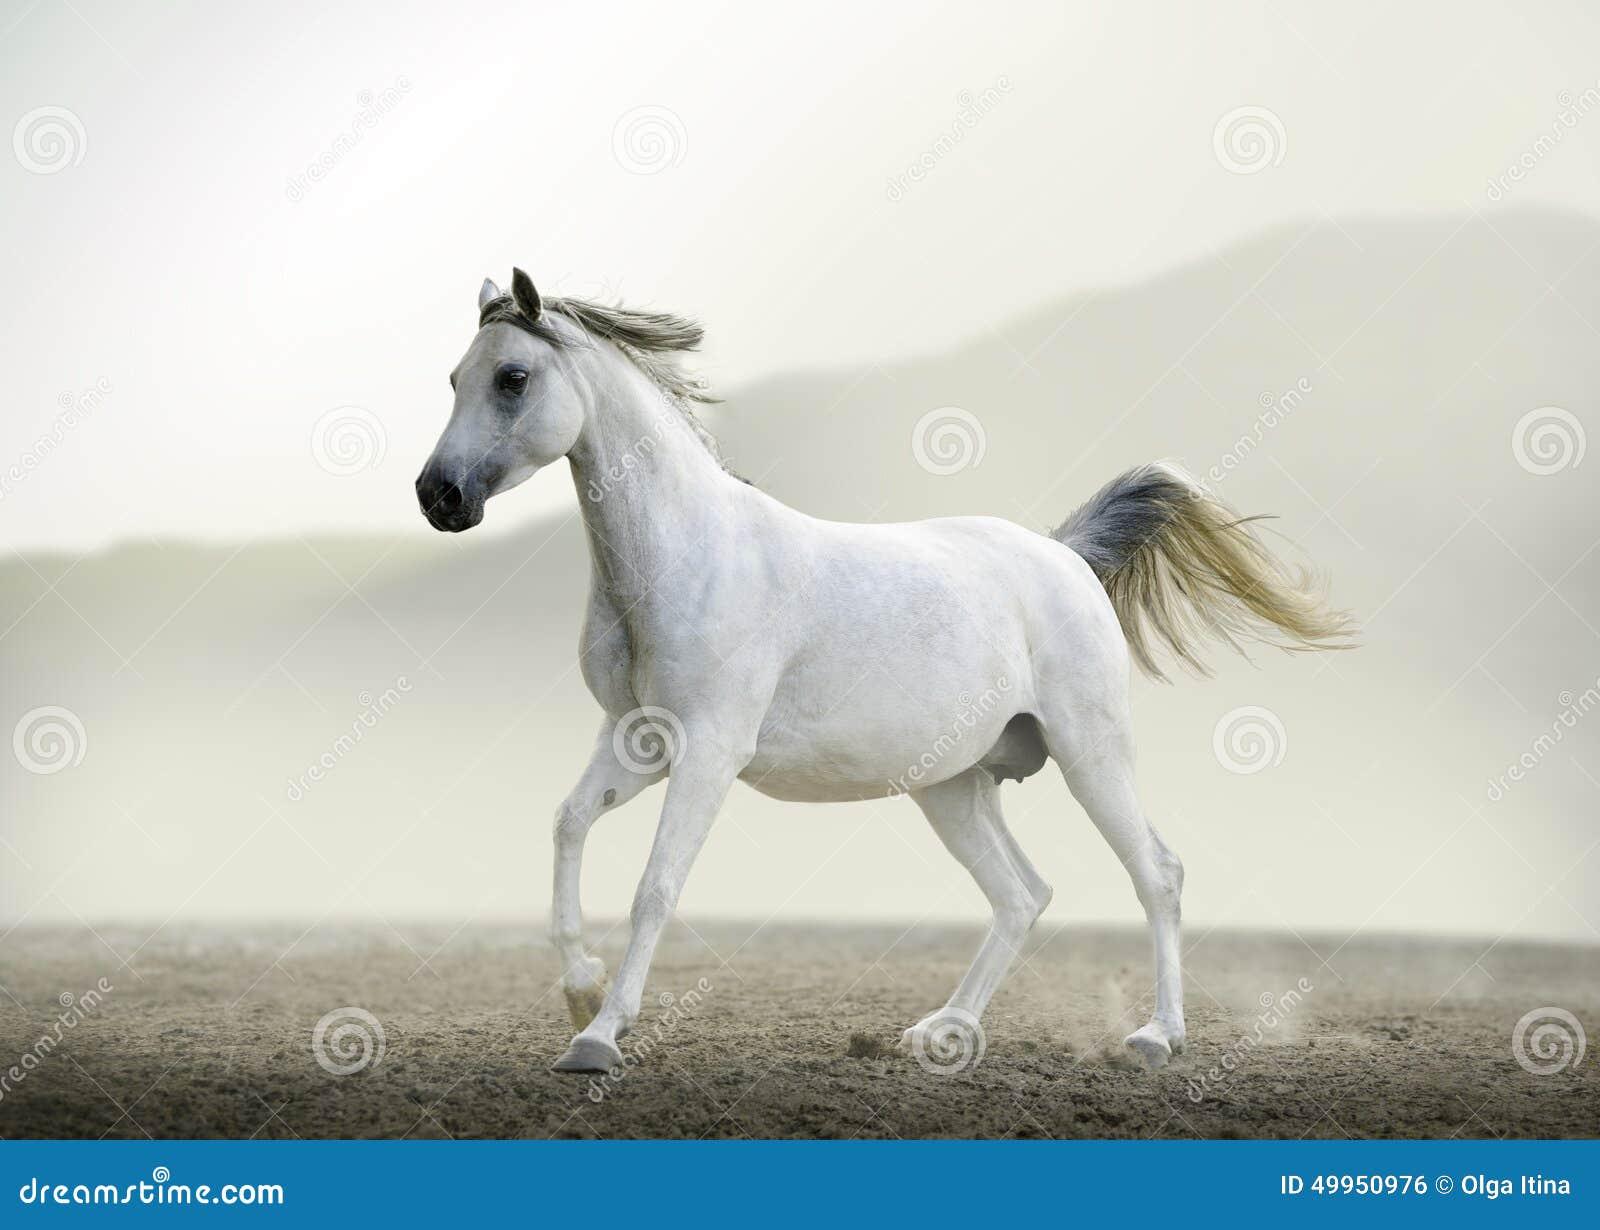 Purebred White Arabian Horse Running In Desert Stock Photo ...